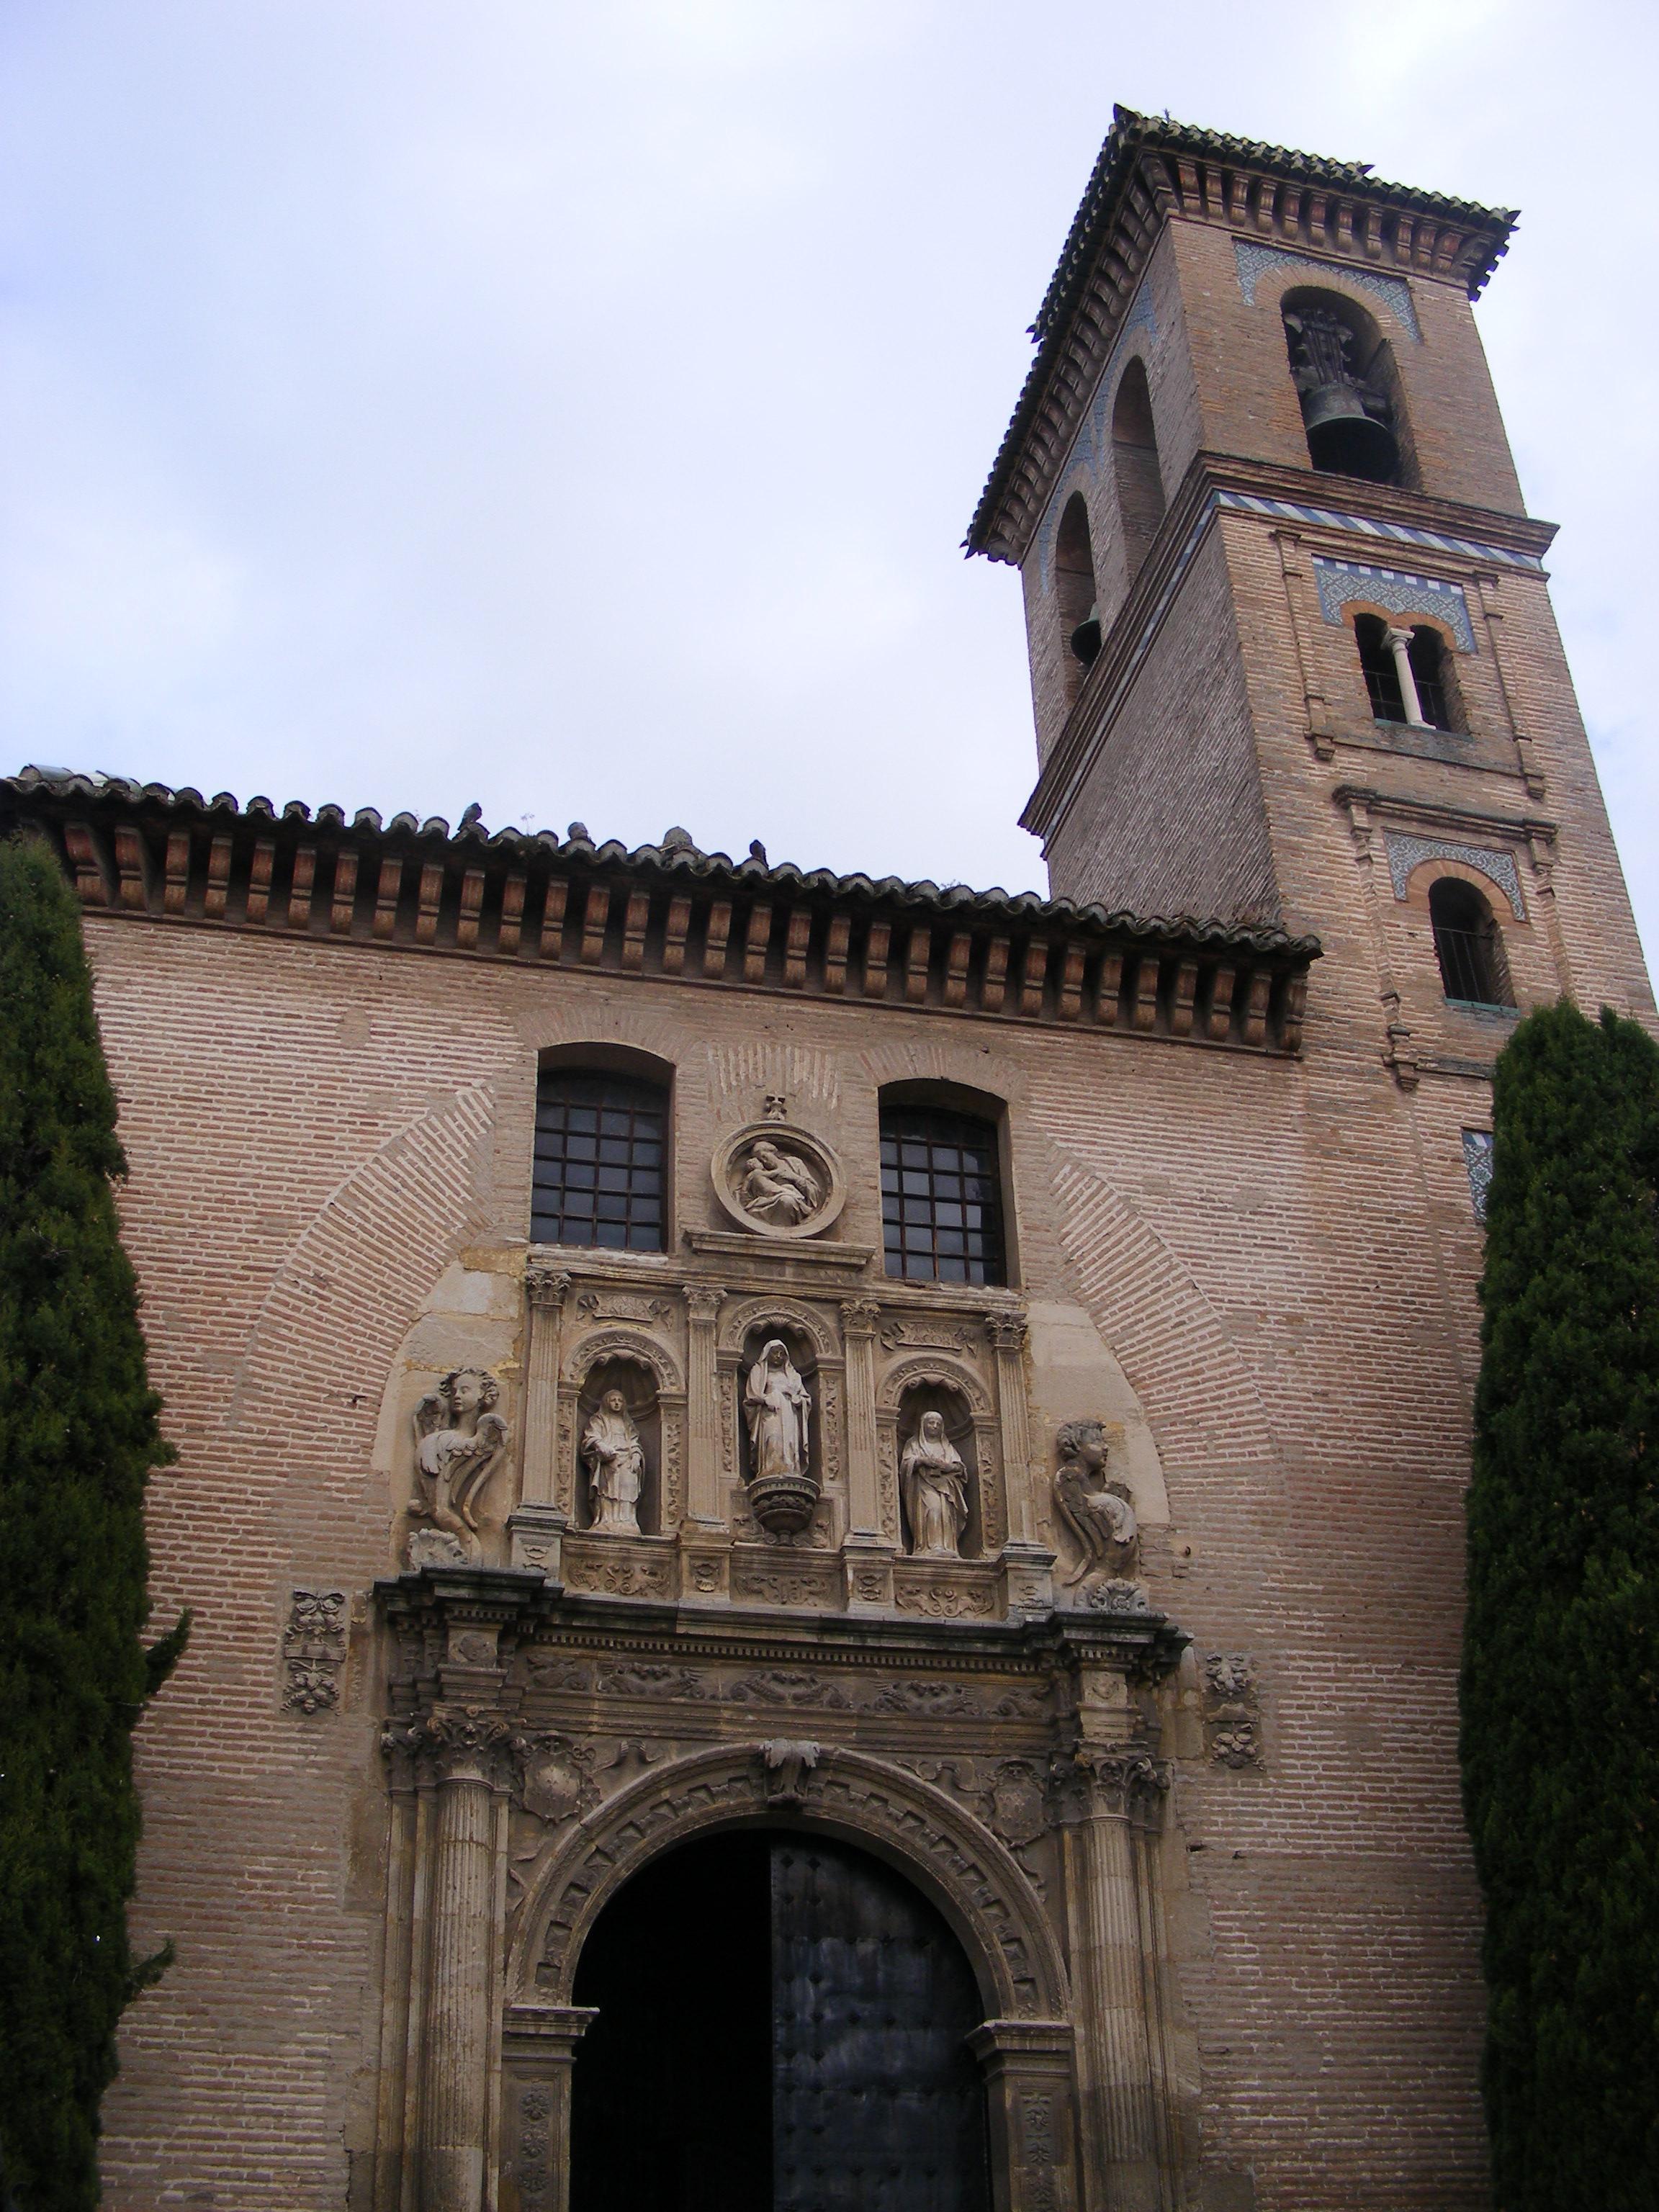 Bodas iglesia santa ana granada images - Santa ana granada ...